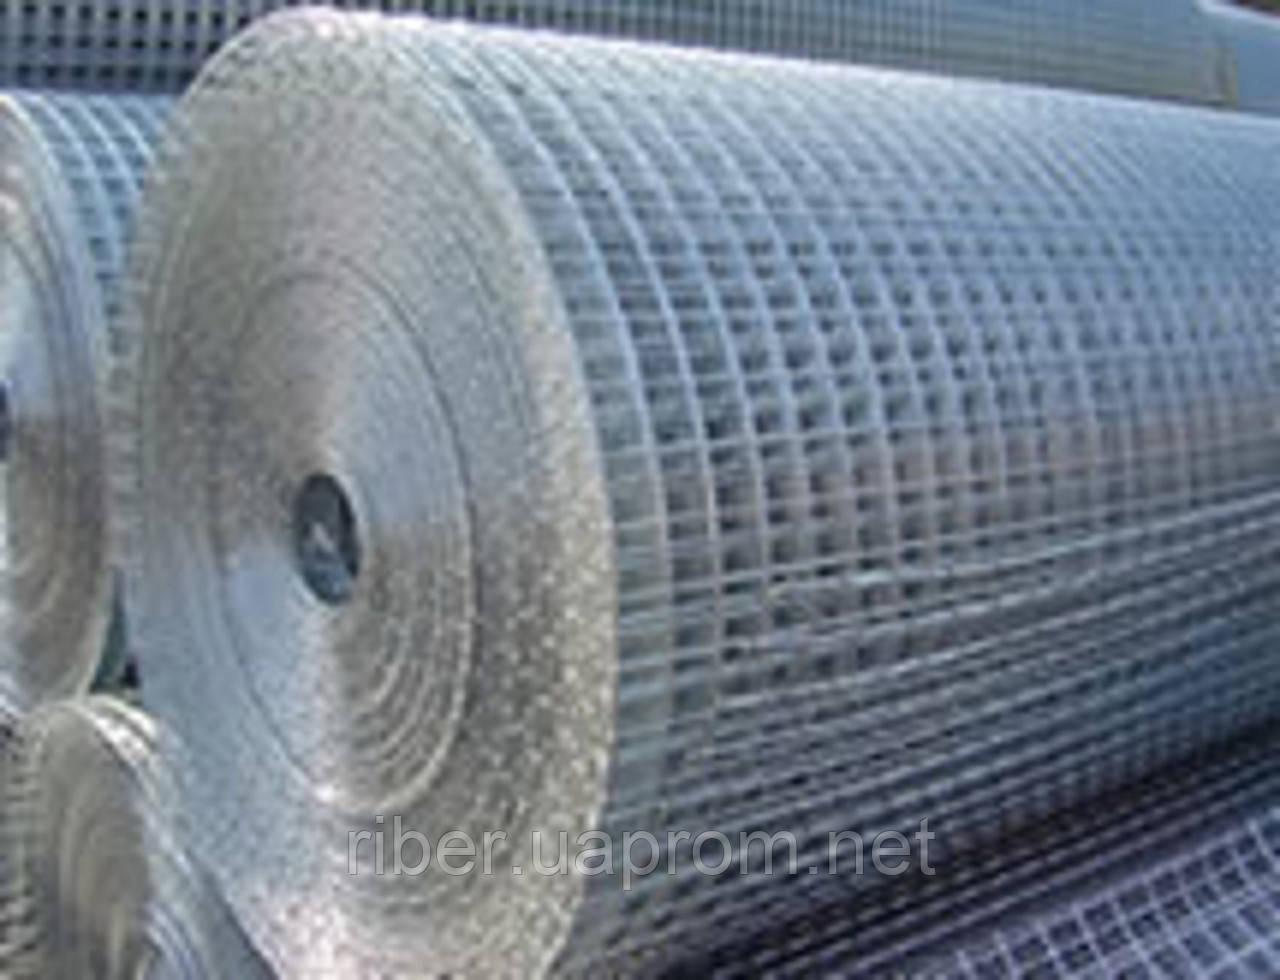 Сварная оцинкованная сетка 25х25х1,4мм